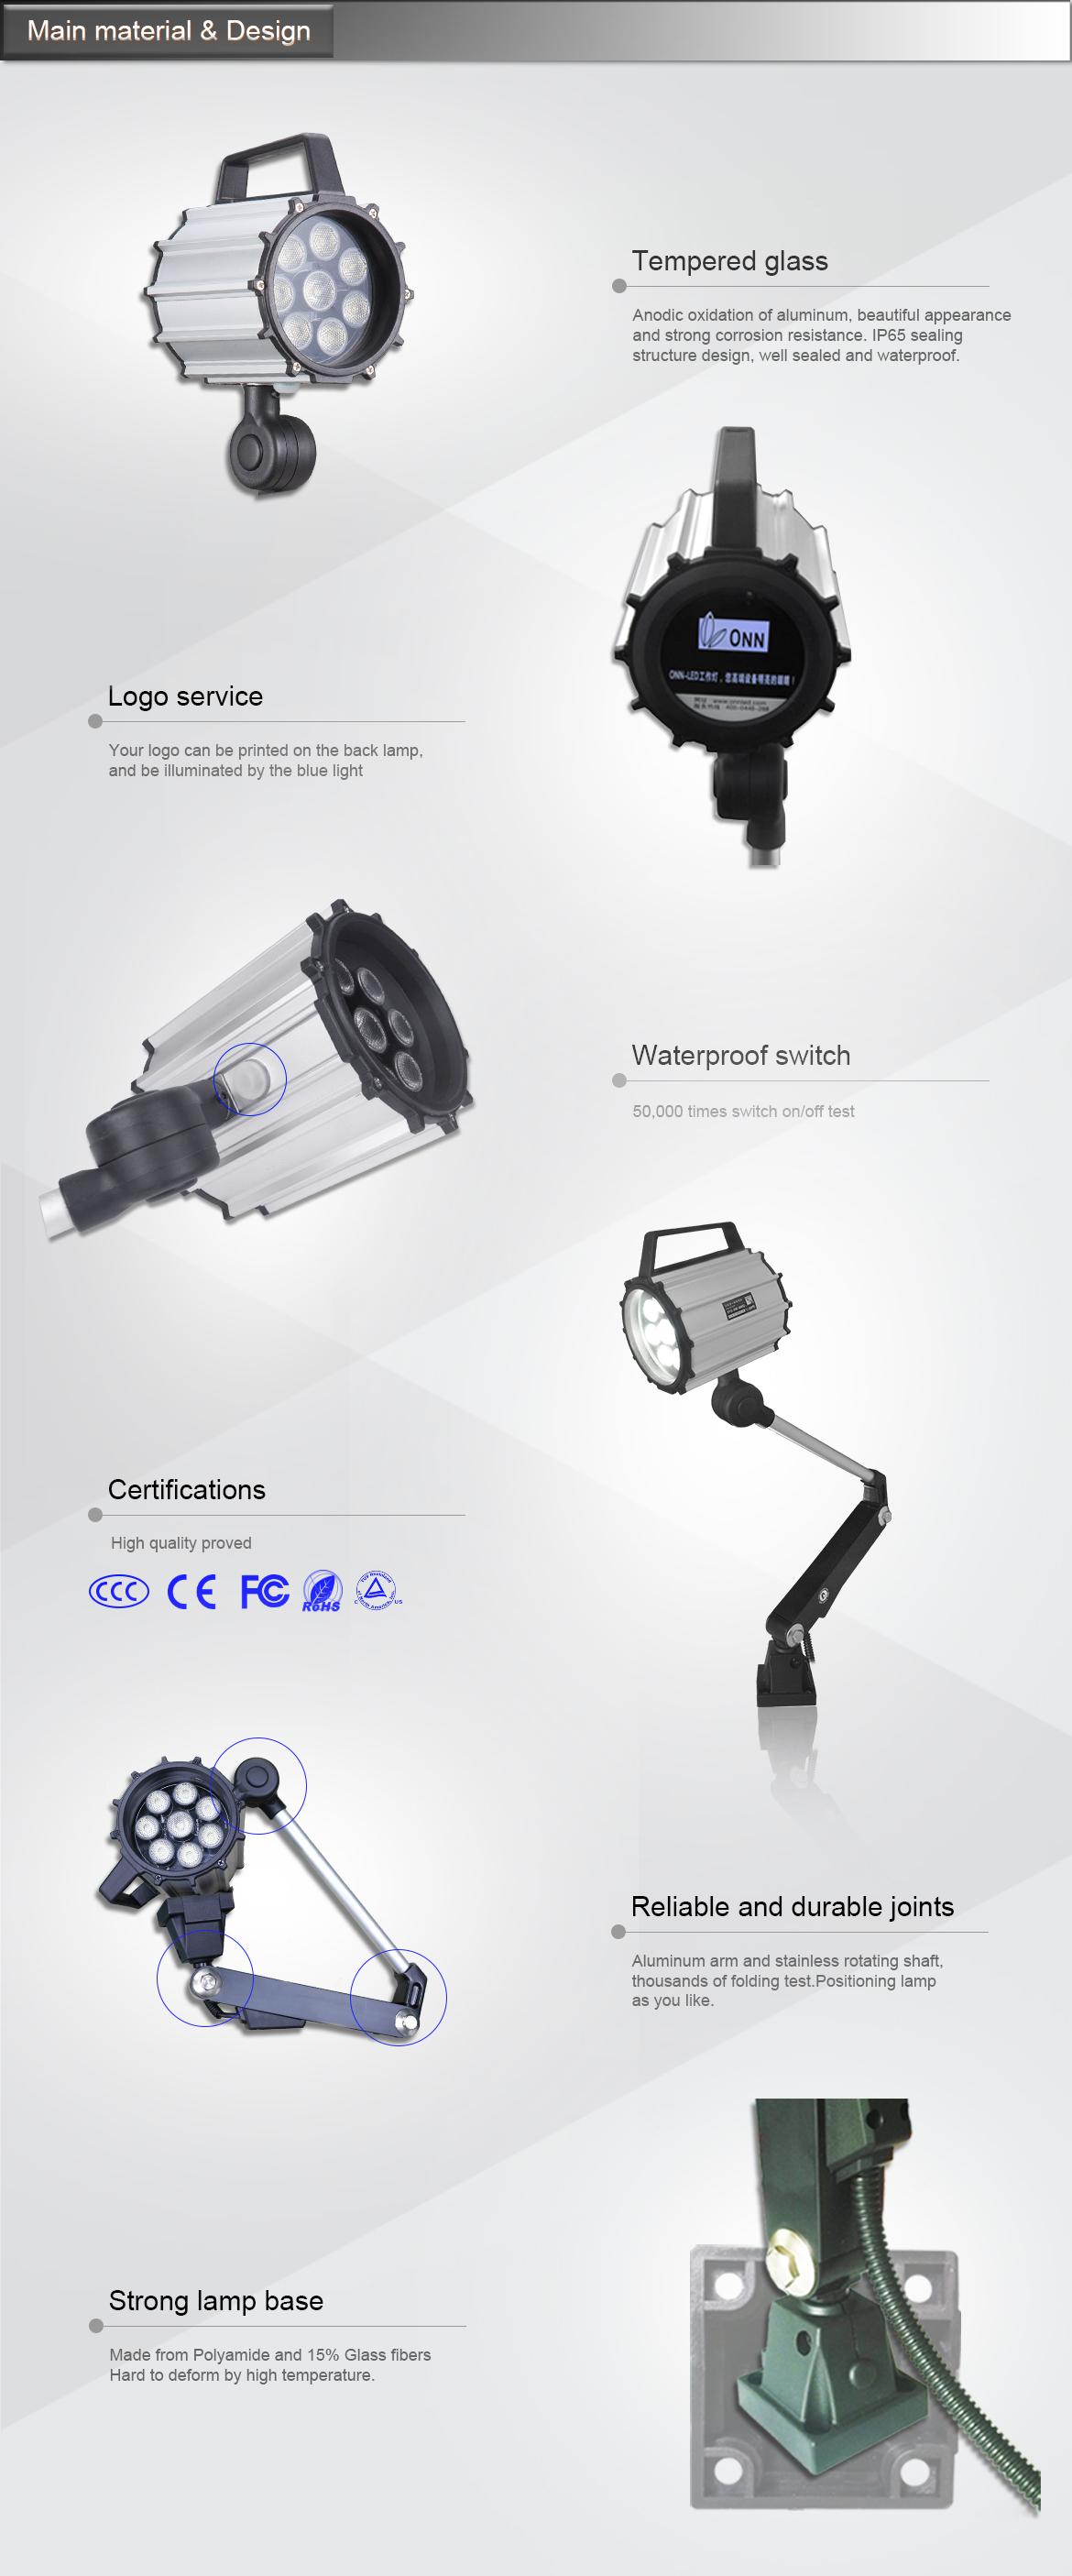 CNC Machine Lamp/LED Machine Lighting CNC/LED Flexible Arm Light M2 IP65 CE,FCC 7W/9.5W 24V/220V